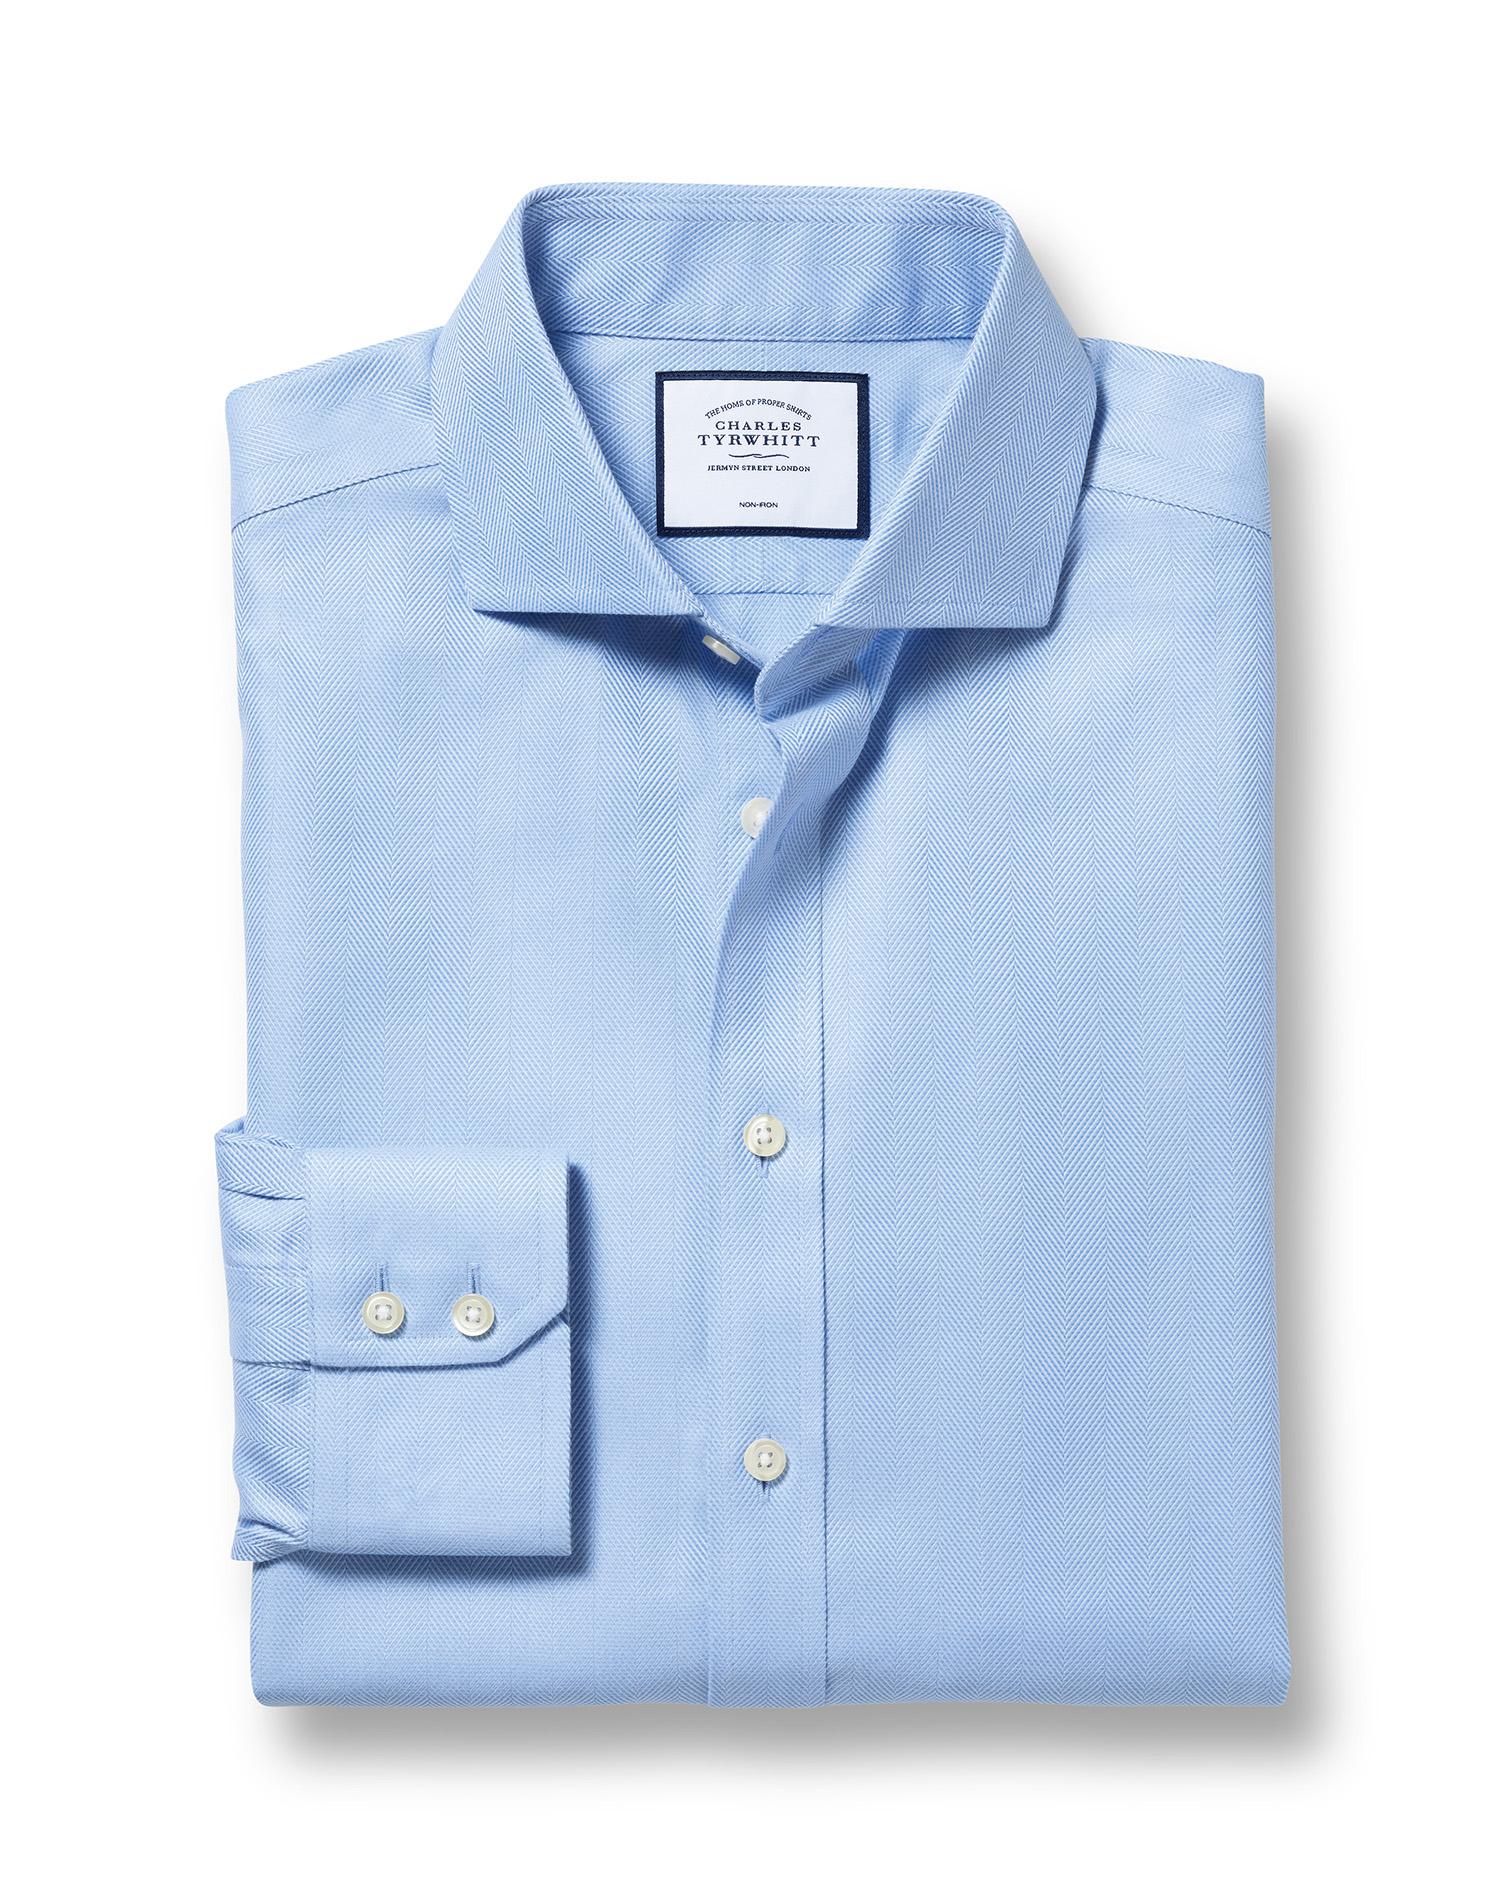 Slim Fit Cutaway Non-Iron Herringbone Sky Blue Cotton Formal Shirt Single Cuff Size 15/35 by Charles